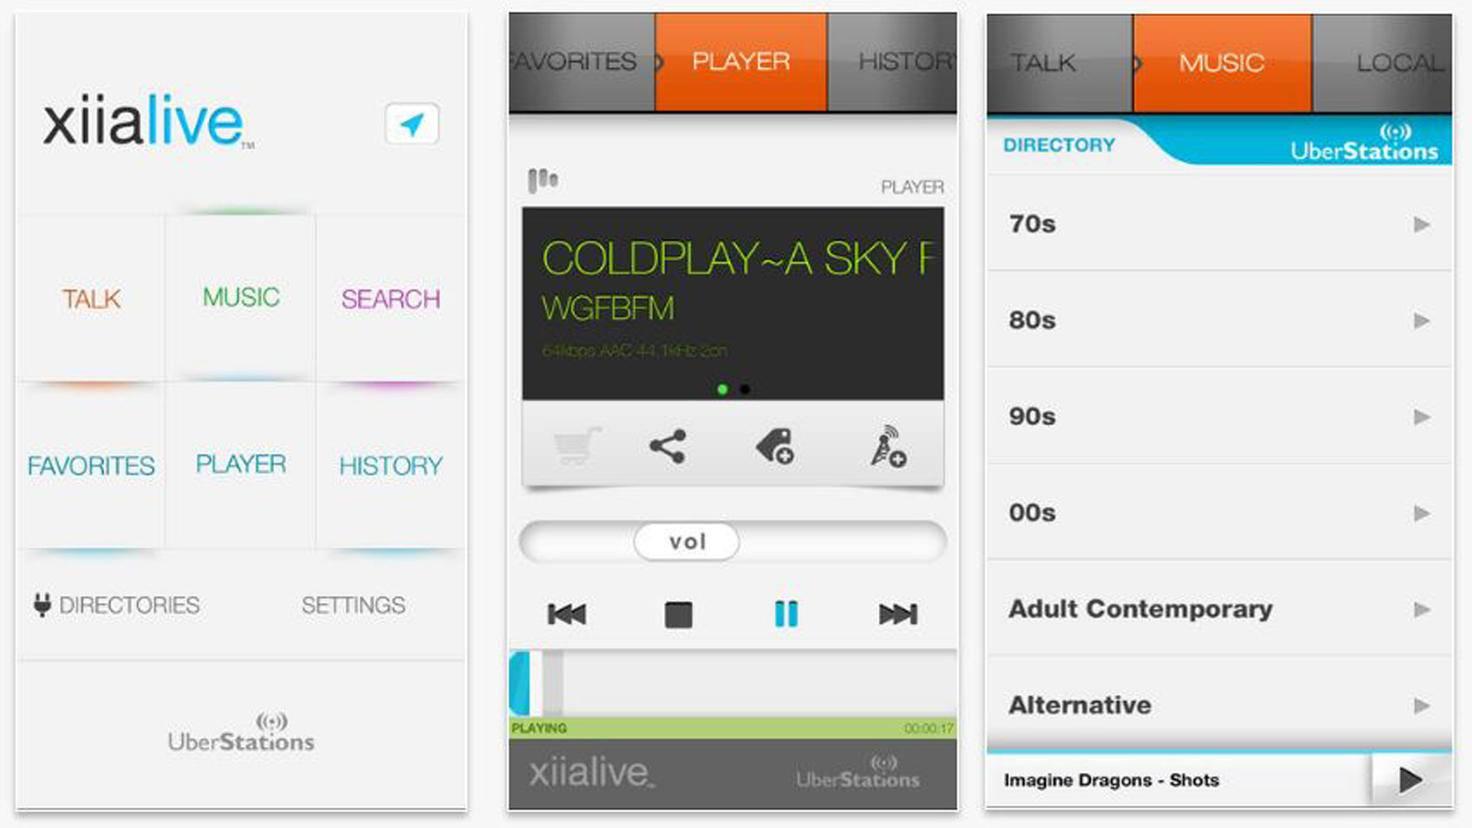 XiiaLive-iTunes-Visual Blasters LLC